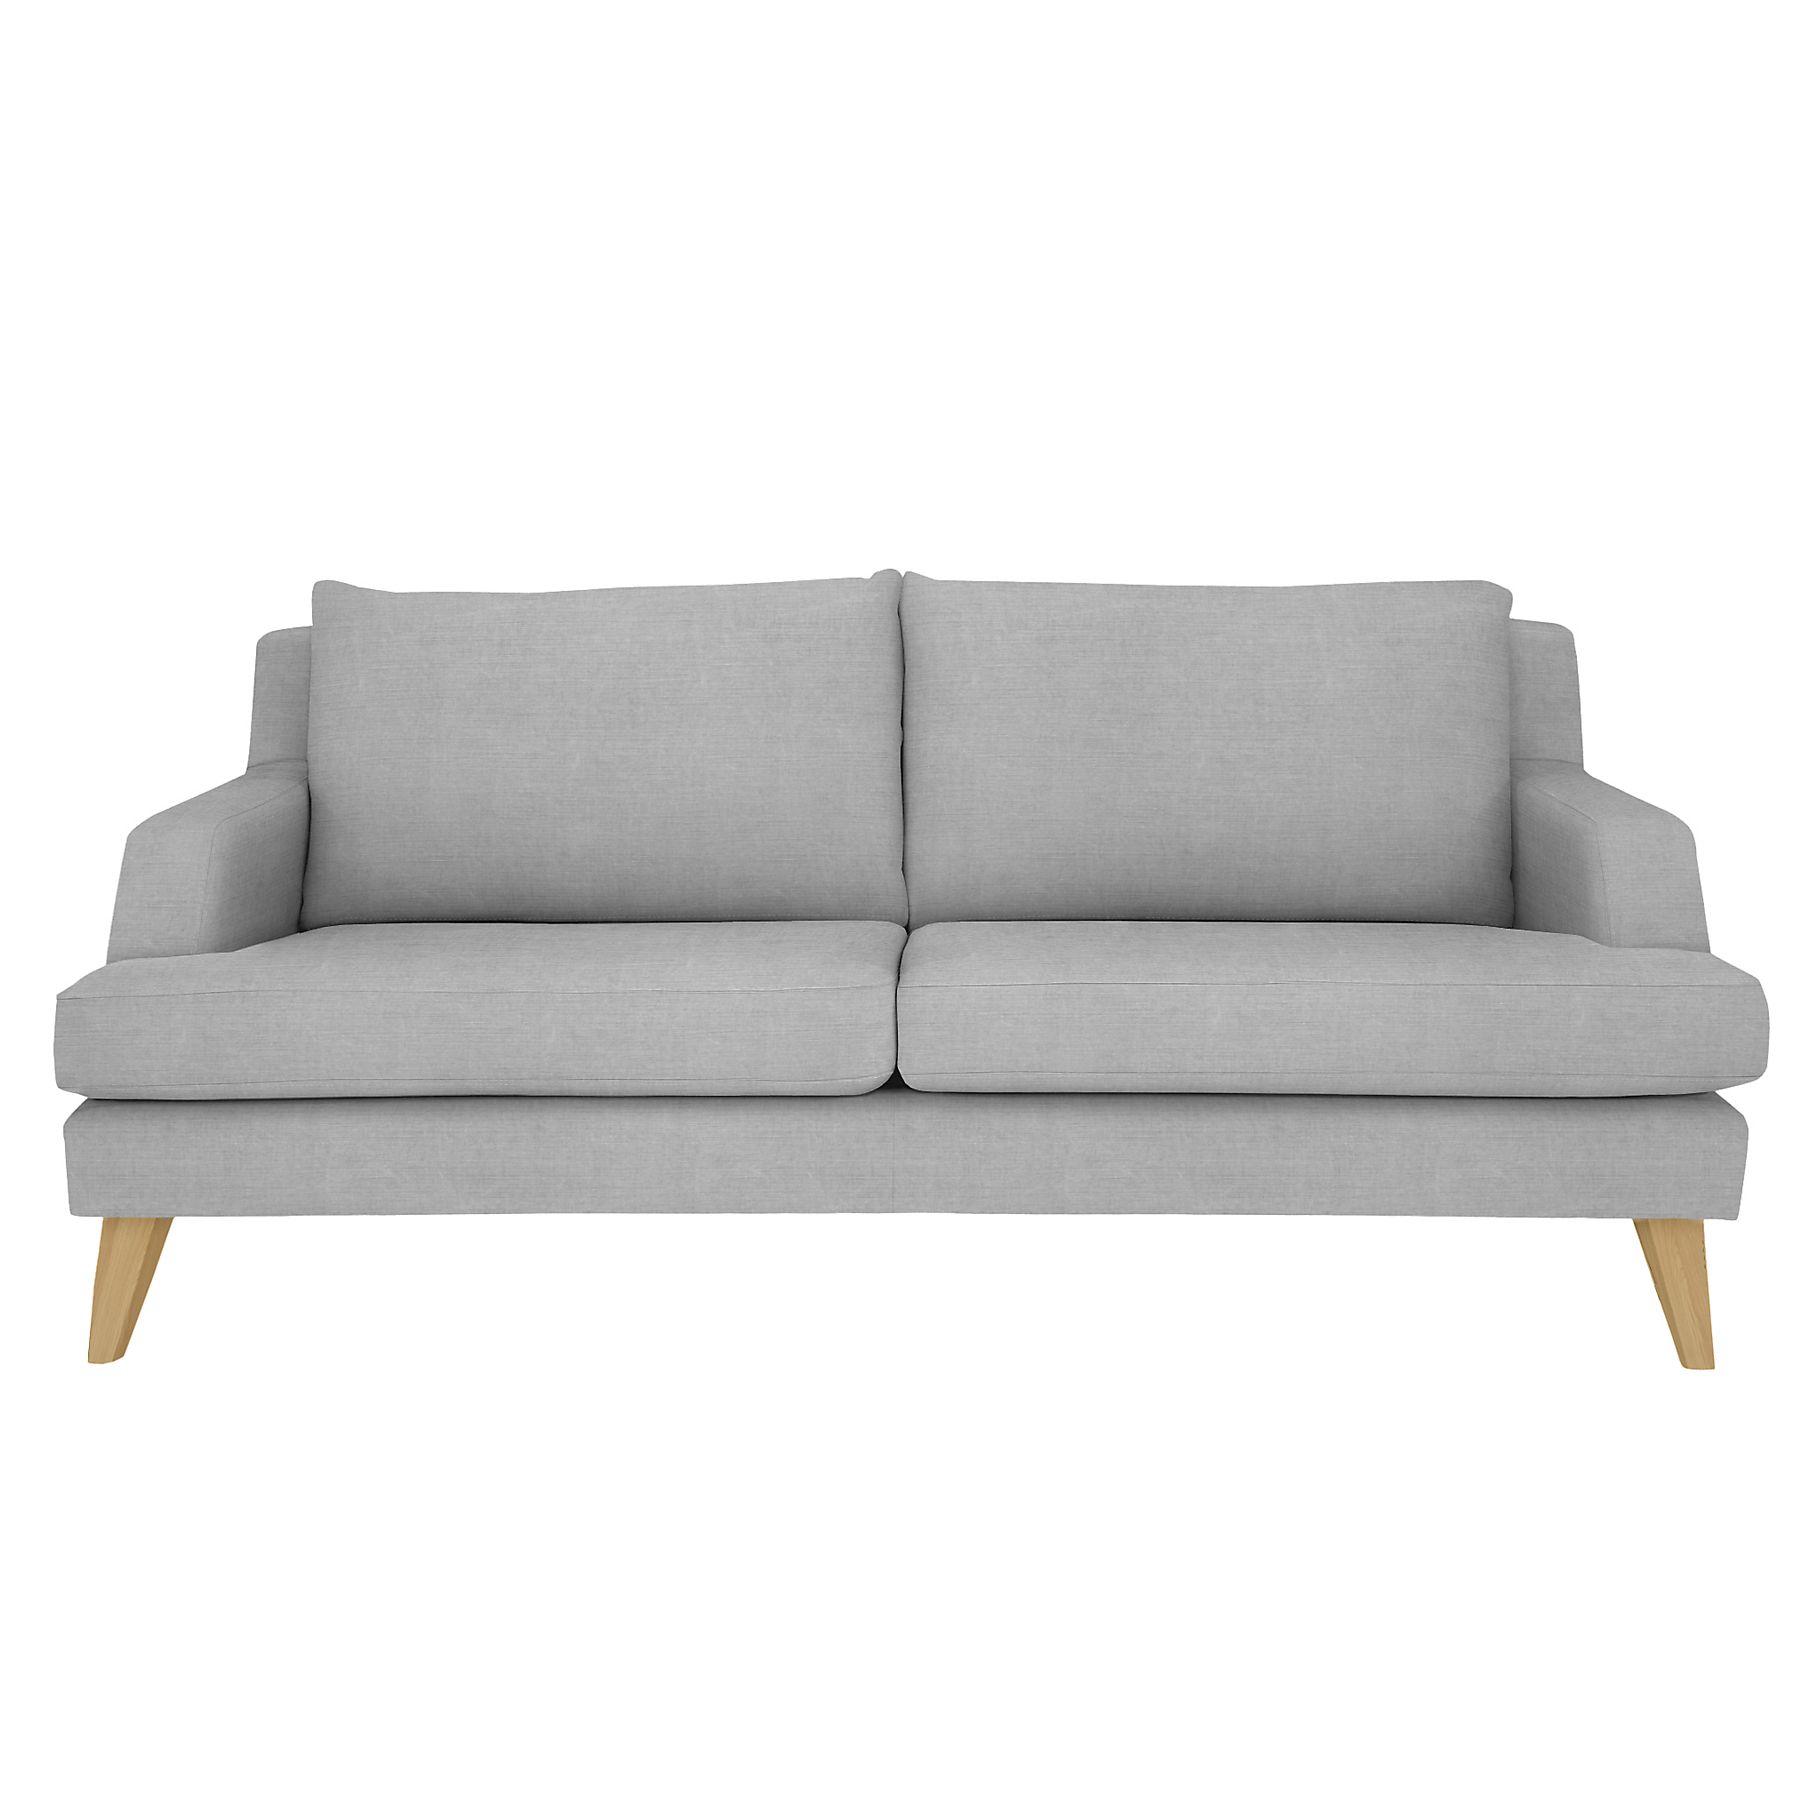 john lewis buzz small sofa. Black Bedroom Furniture Sets. Home Design Ideas